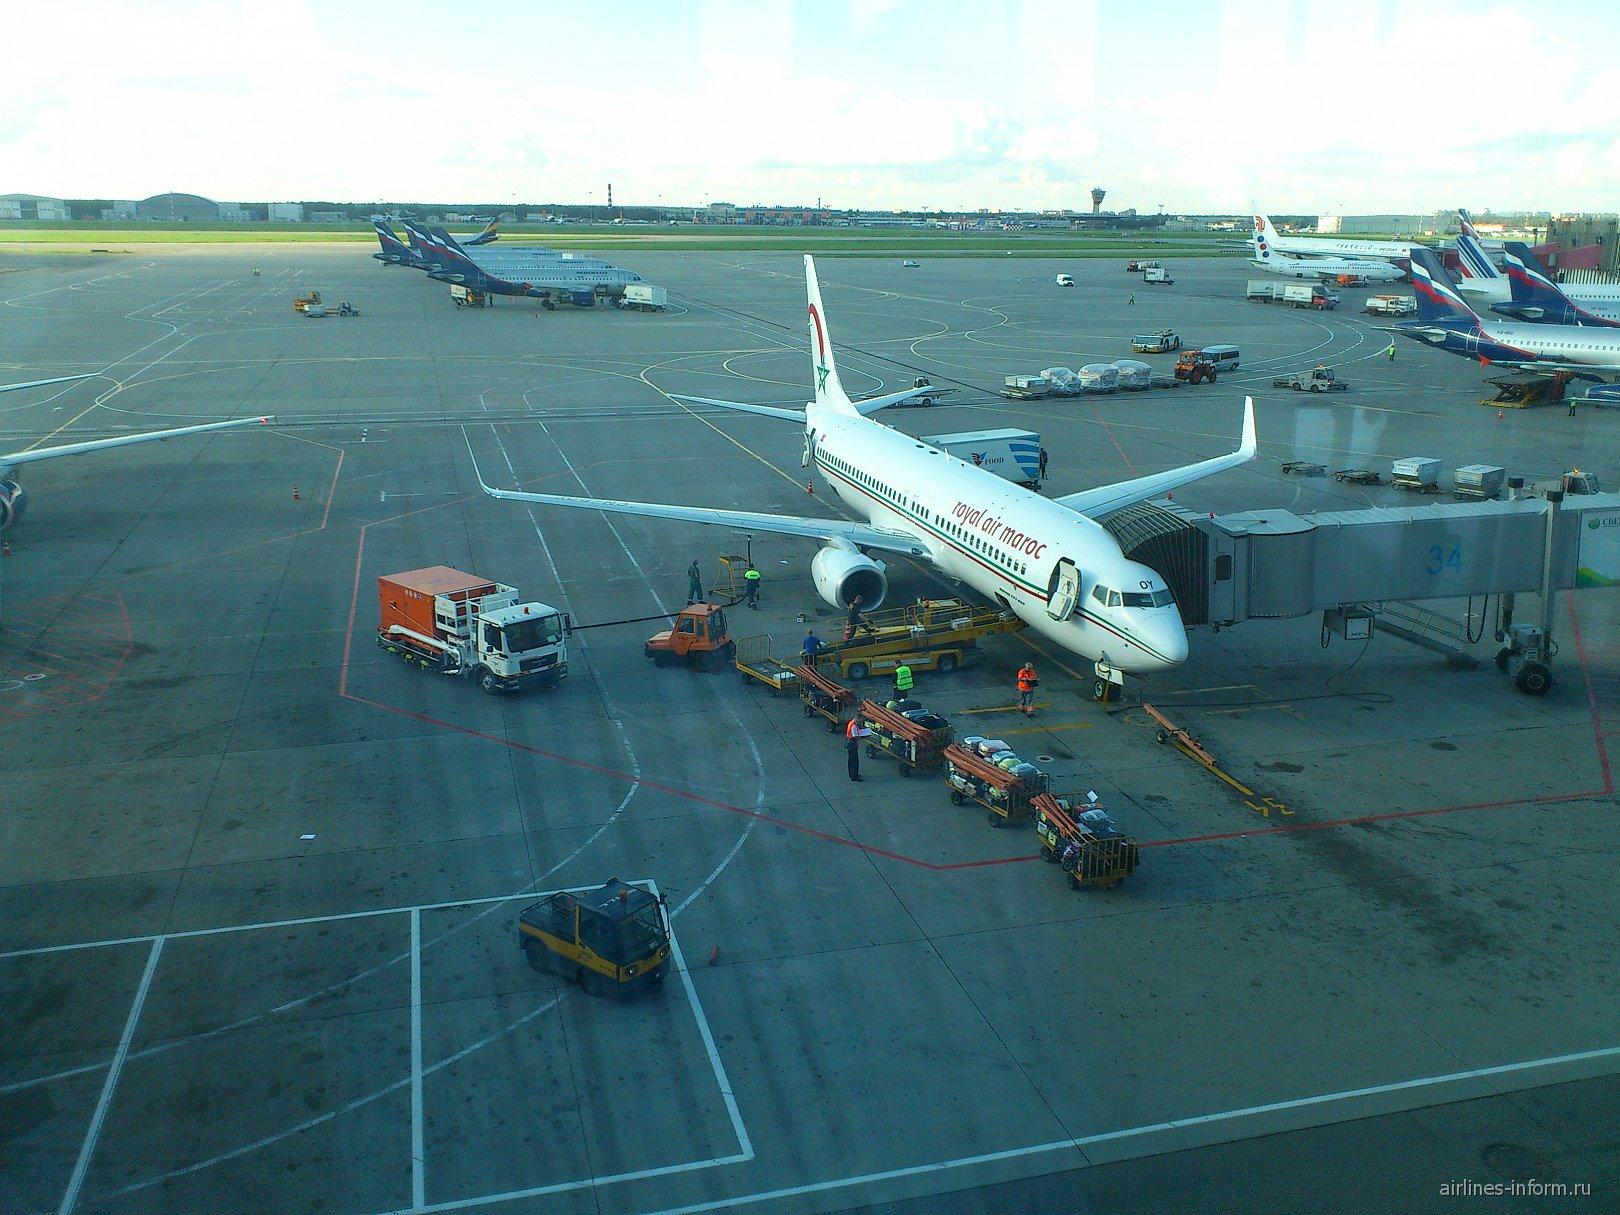 Боинг-737-800 авиакомпании Royal Air Maroc в аэропорту Шереметьево